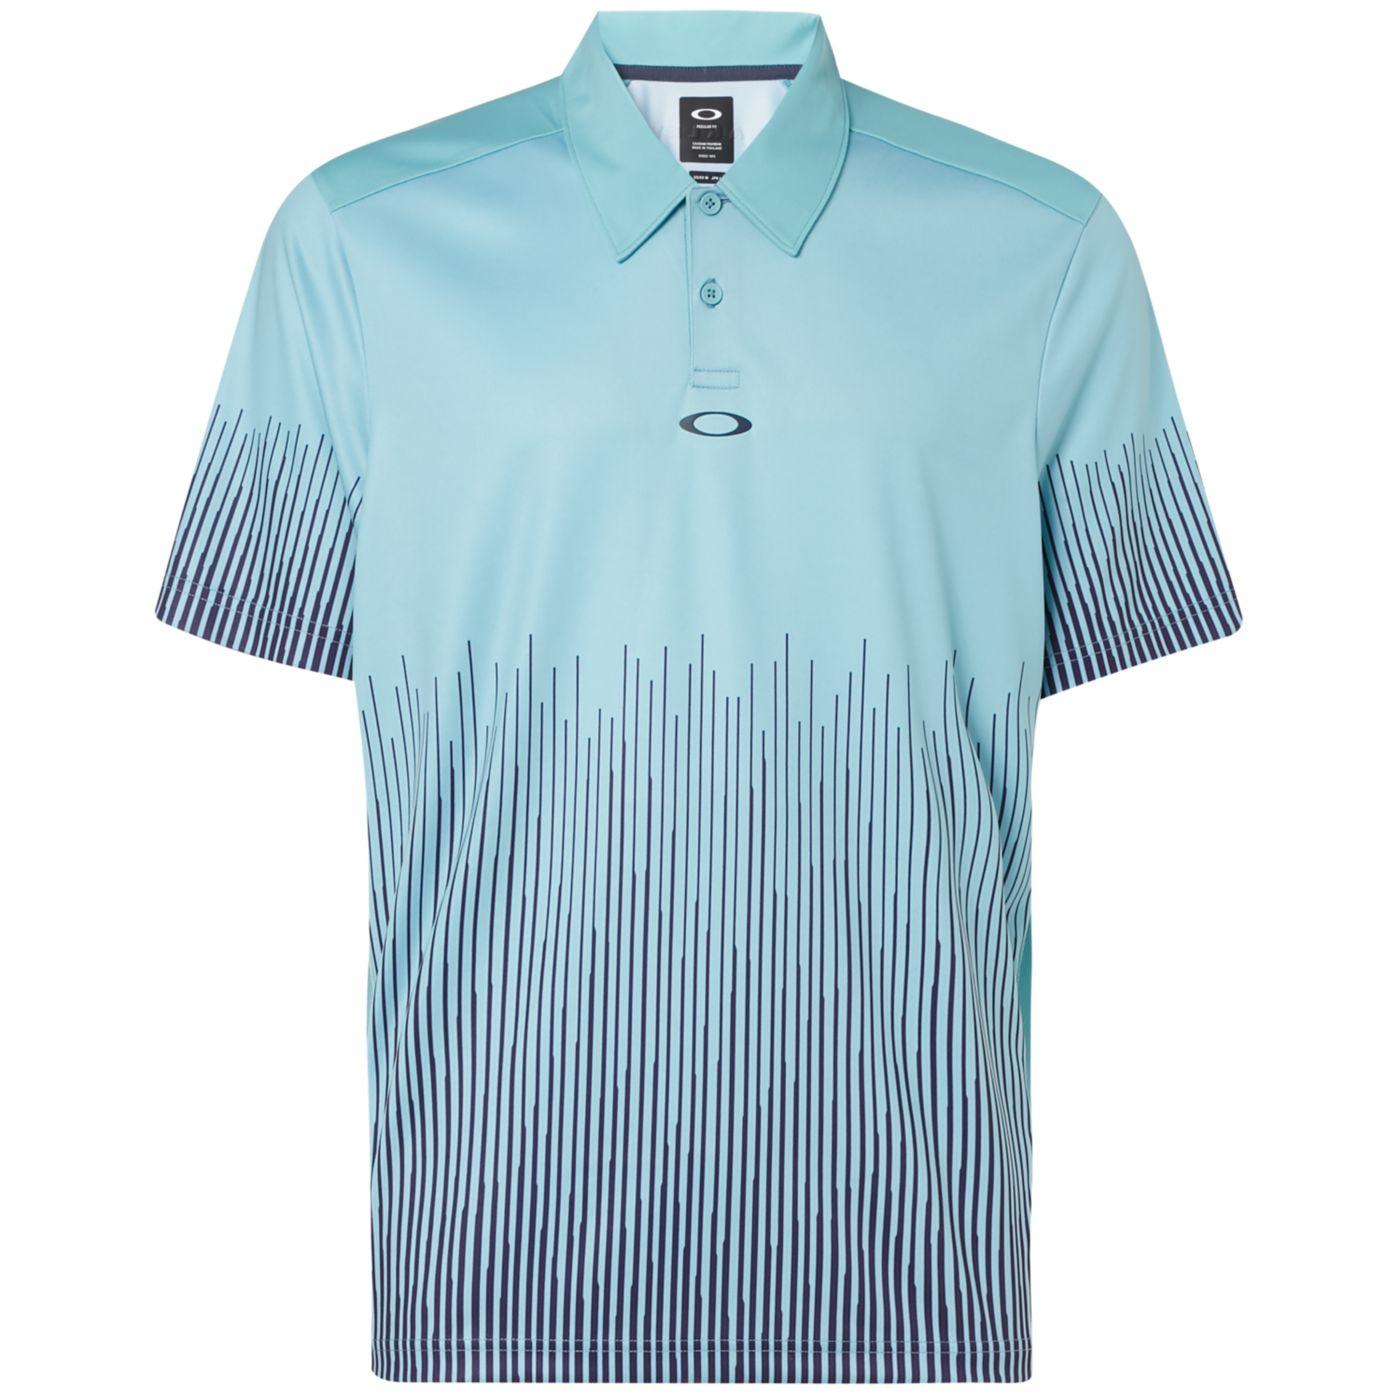 Oakley Men's Football Uniform Golf Polo